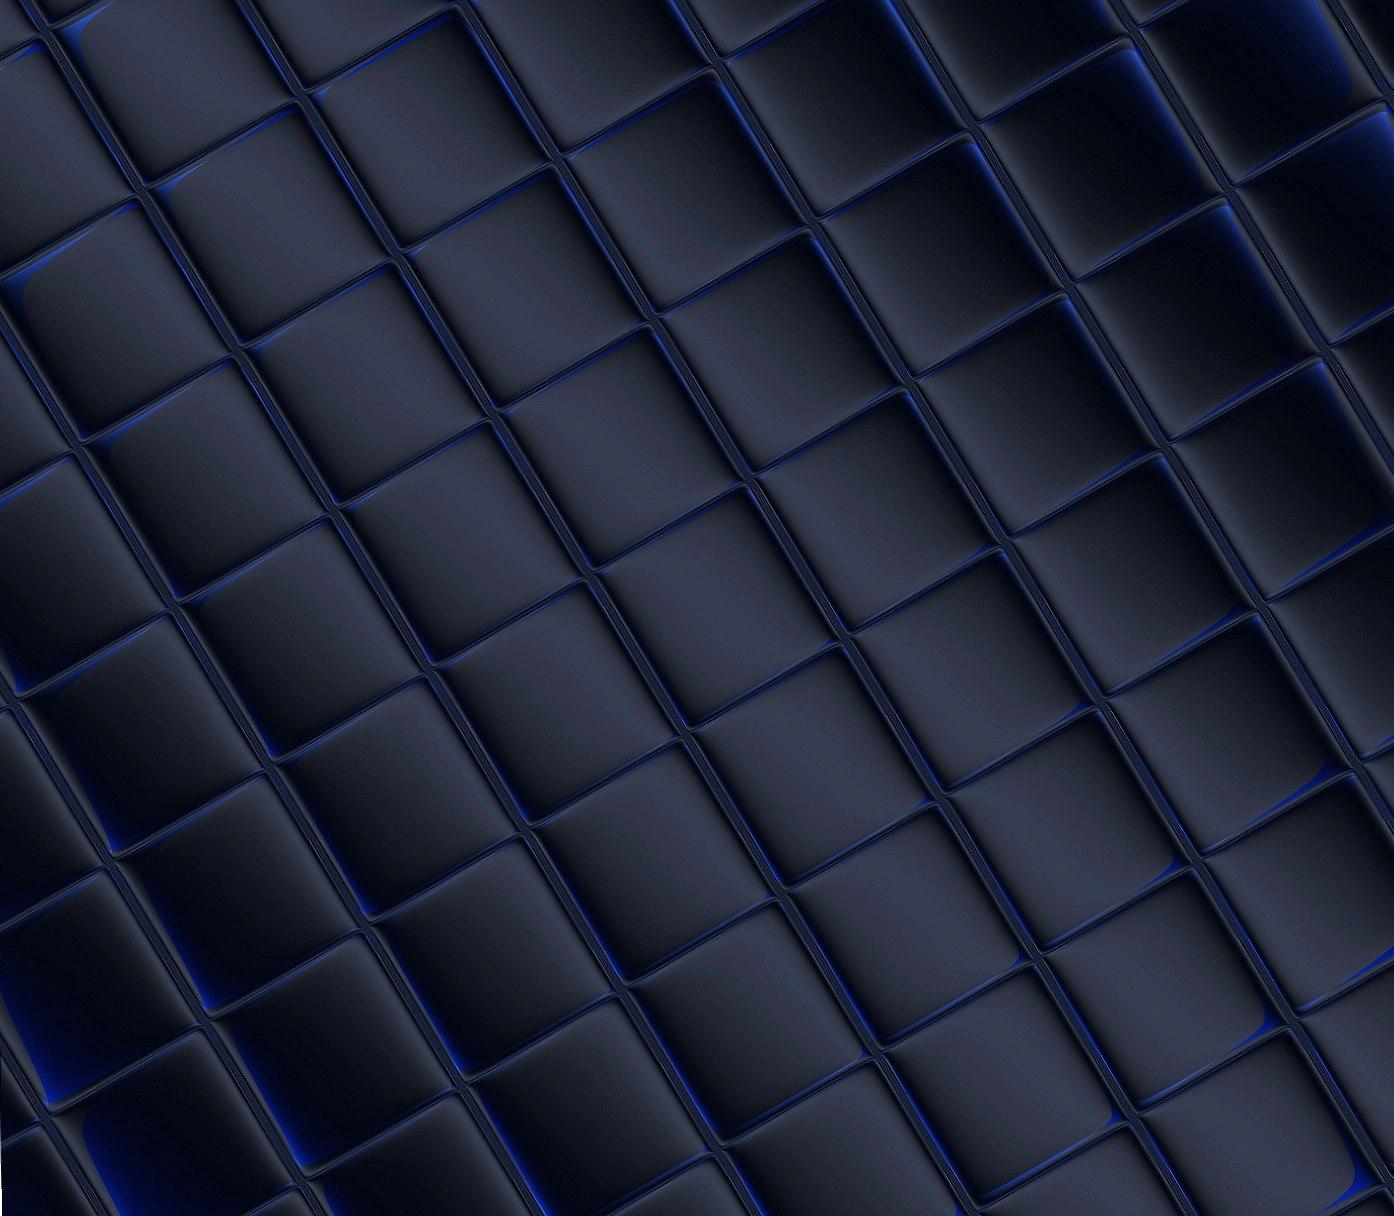 DESIGN-NO1-NOKIA wallpapers HD quality